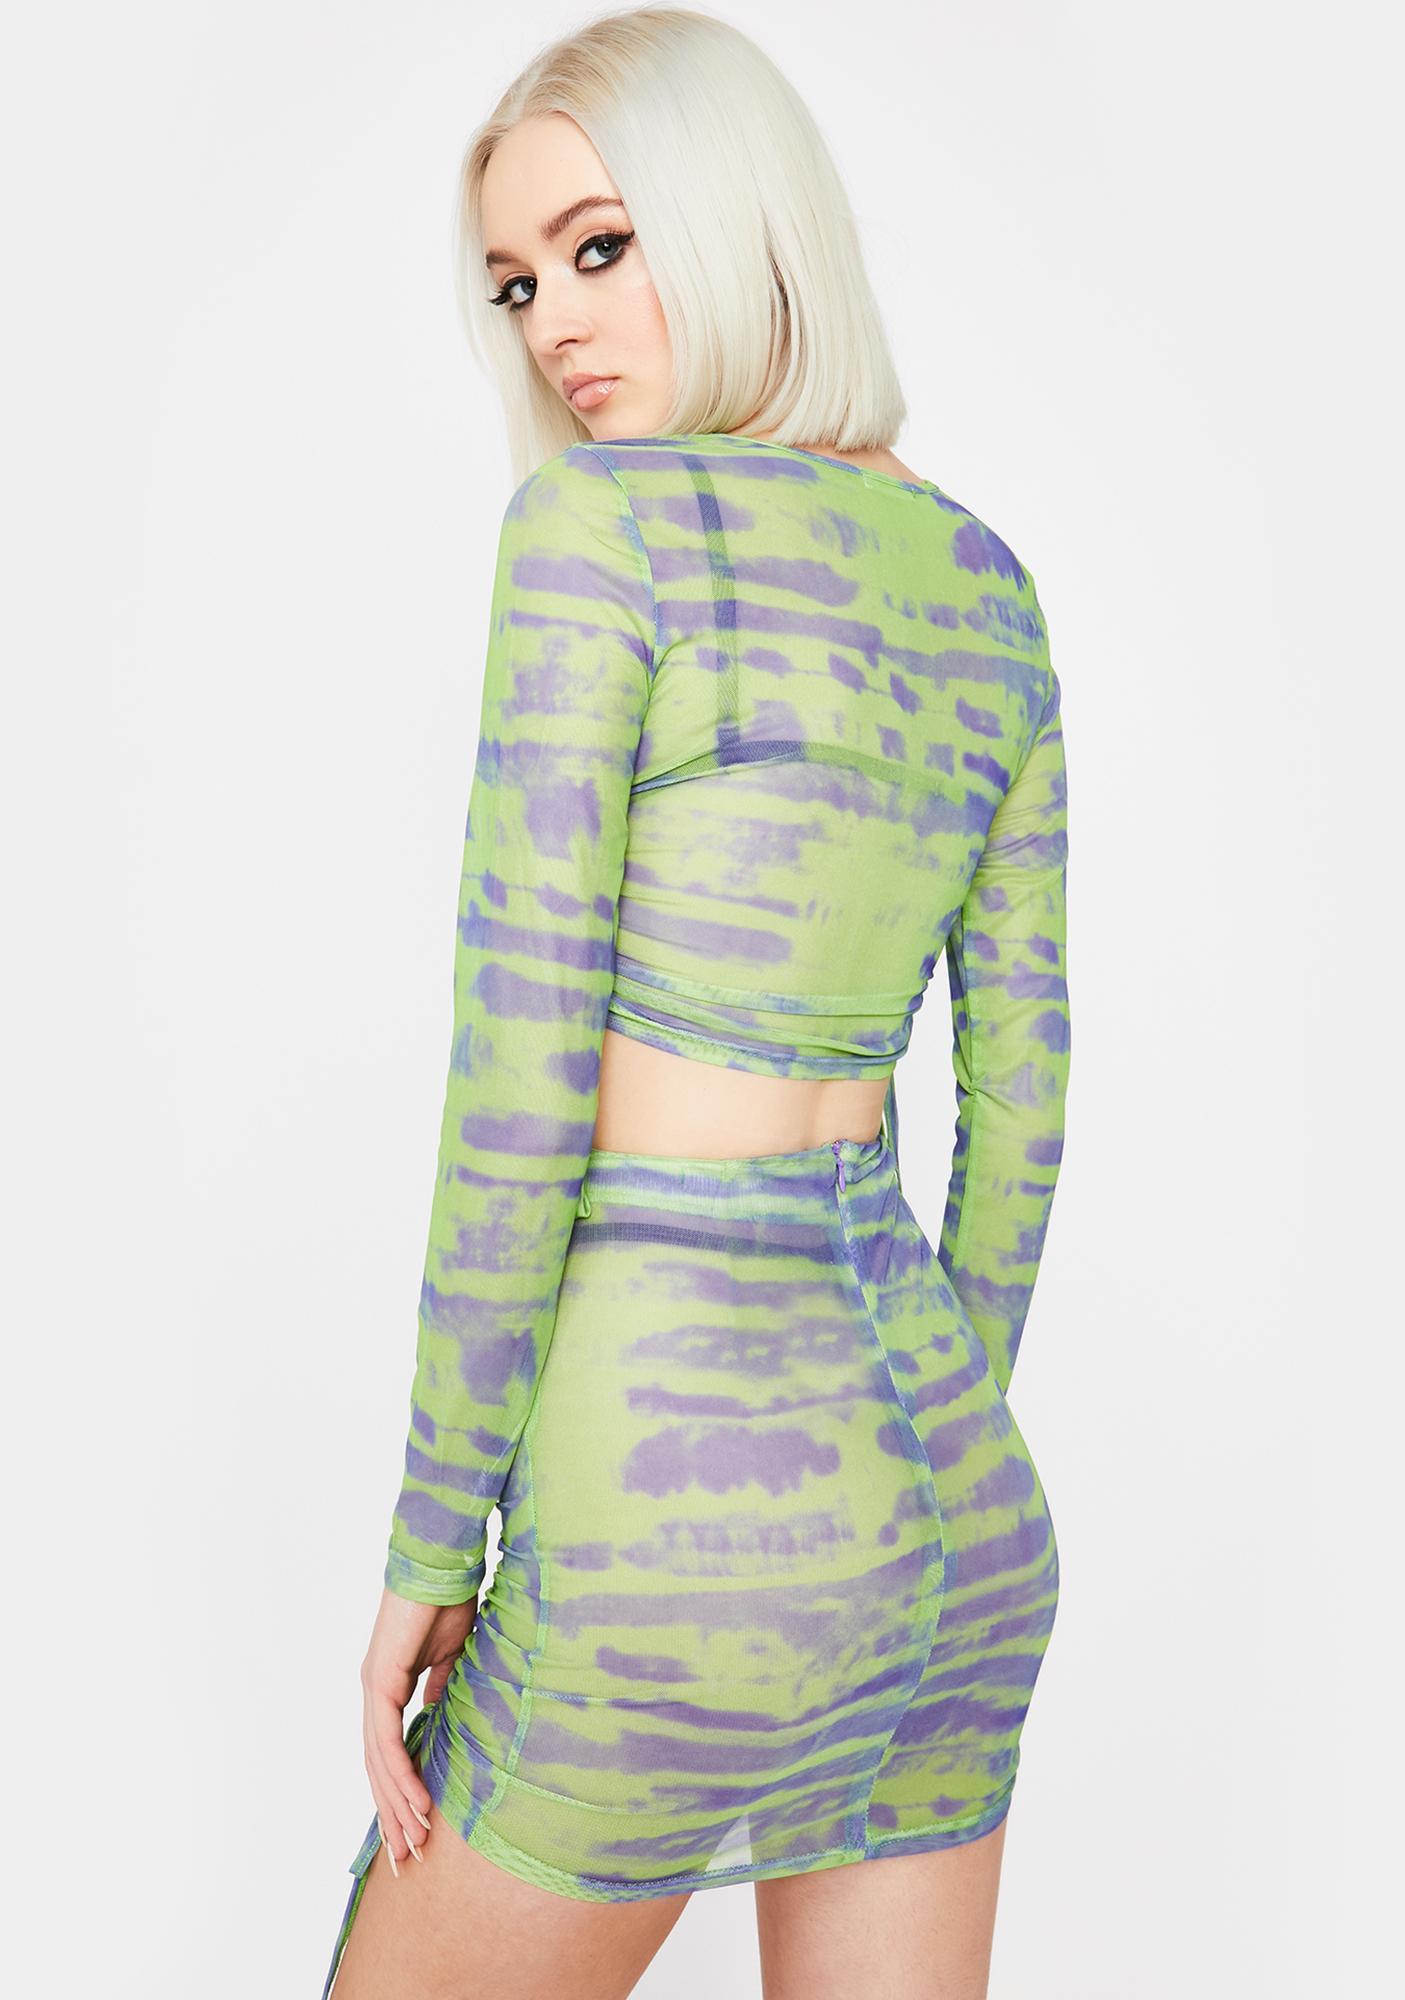 Lime Tough Competition Mesh Skirt